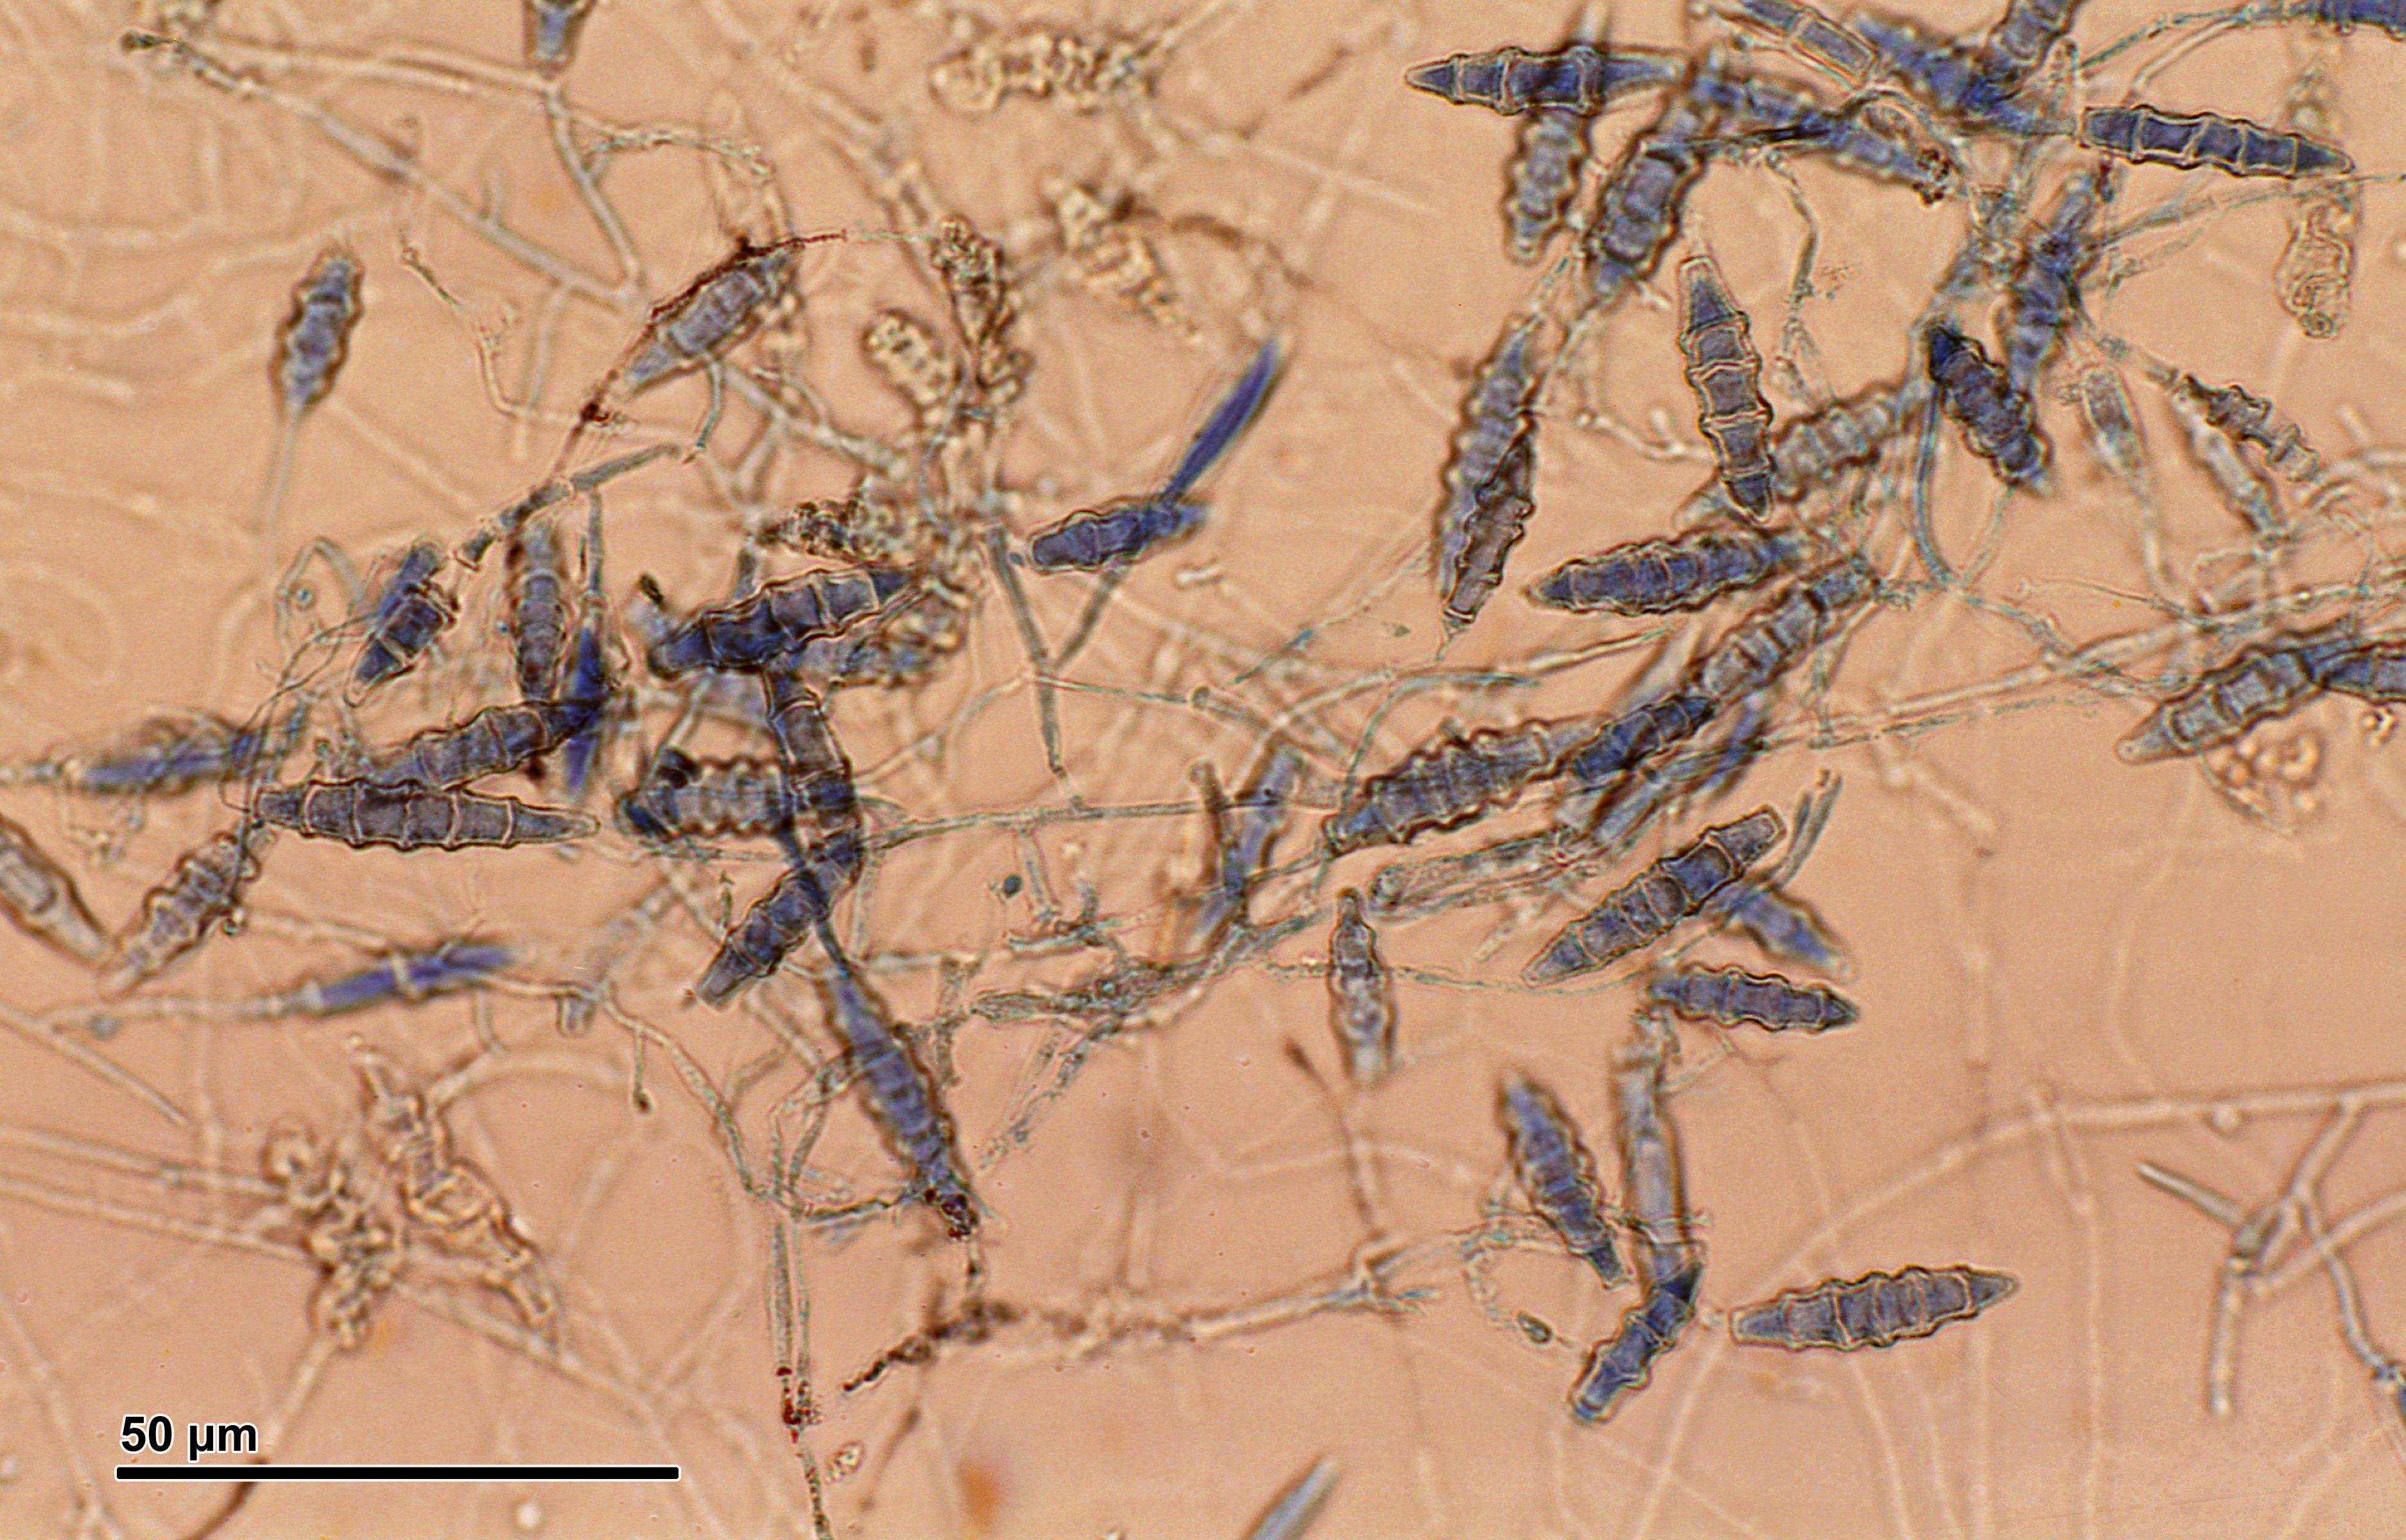 Слика од <i>Microsporum gypseum</i> (E. Bodin) Guiart & Grigoraki 1928